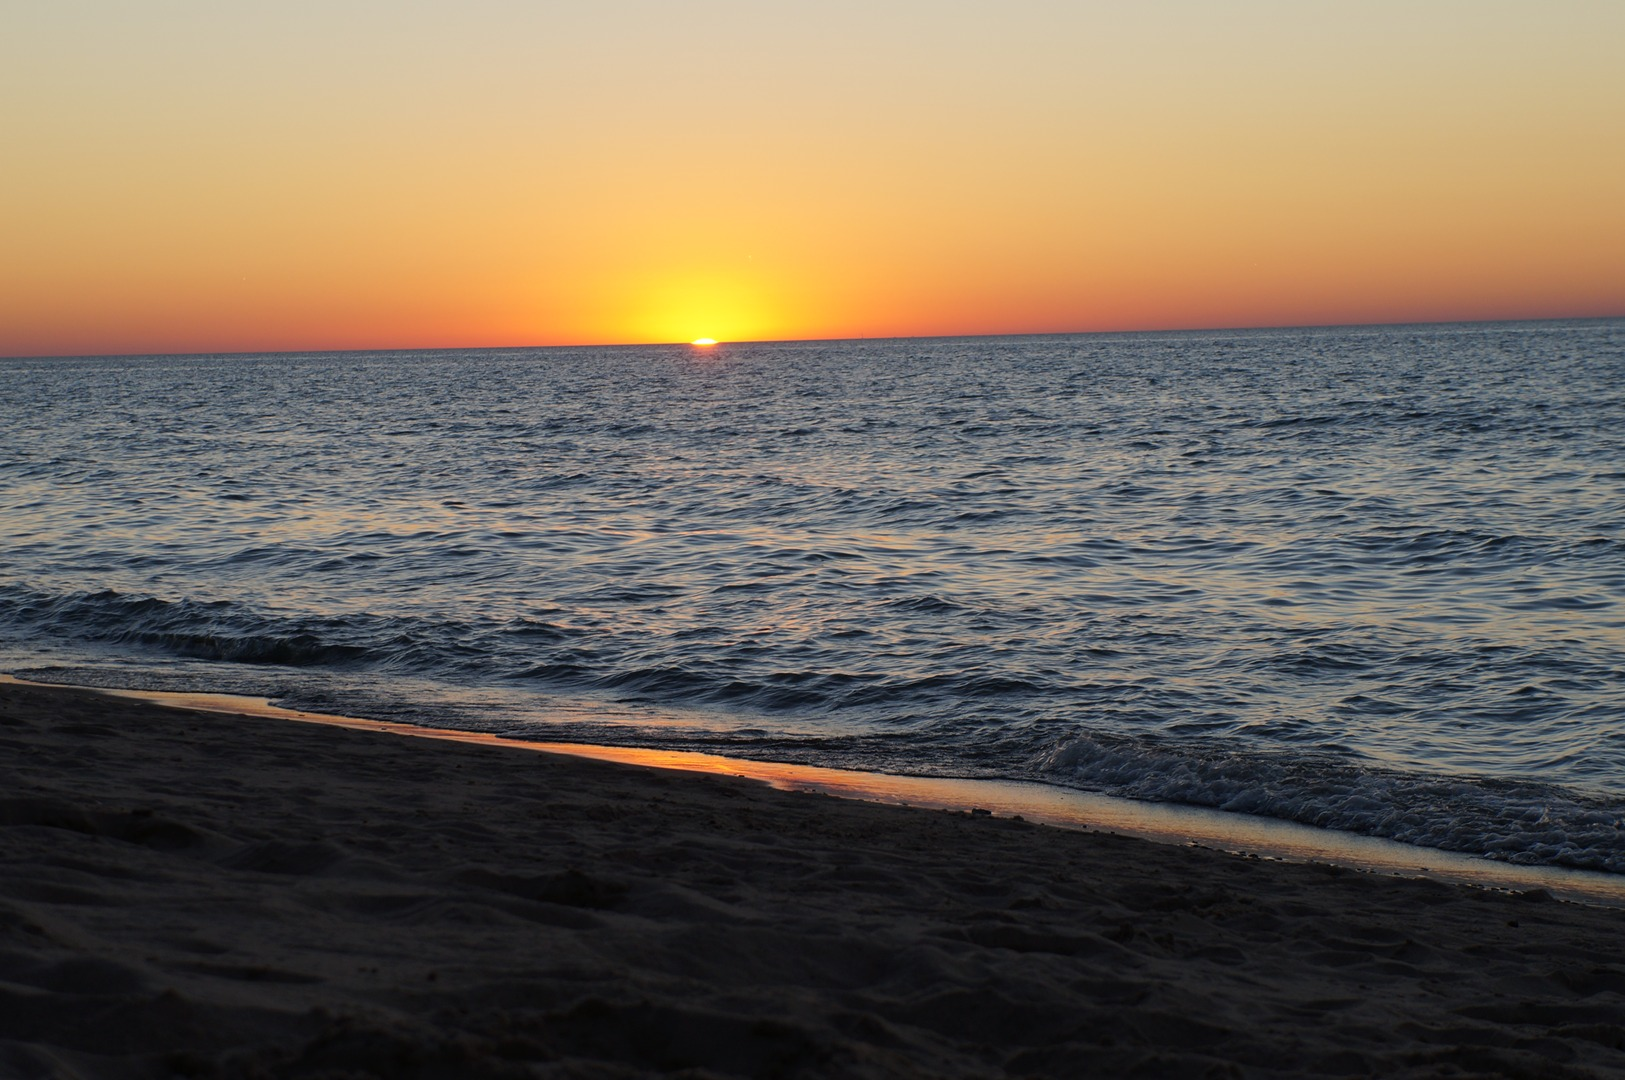 chikaming_parks_beach_sunset.jpg